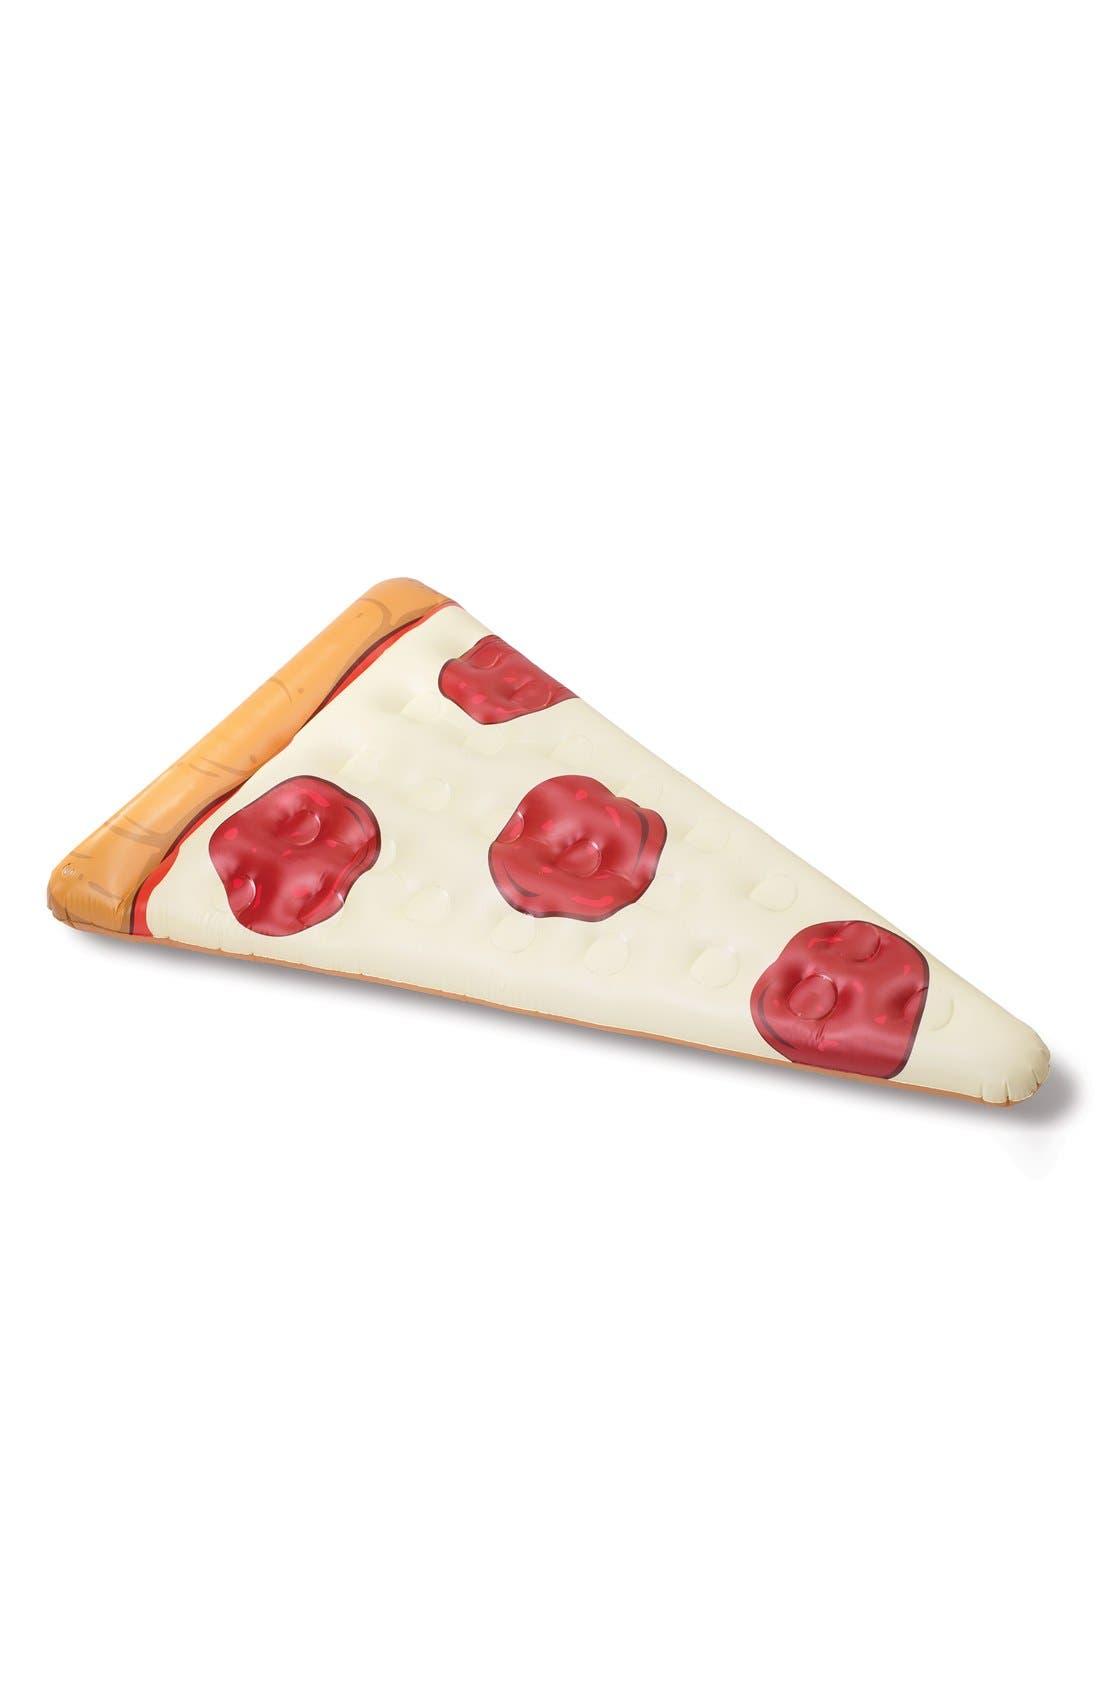 Giant Pizza Slice Pool Float,                             Main thumbnail 1, color,